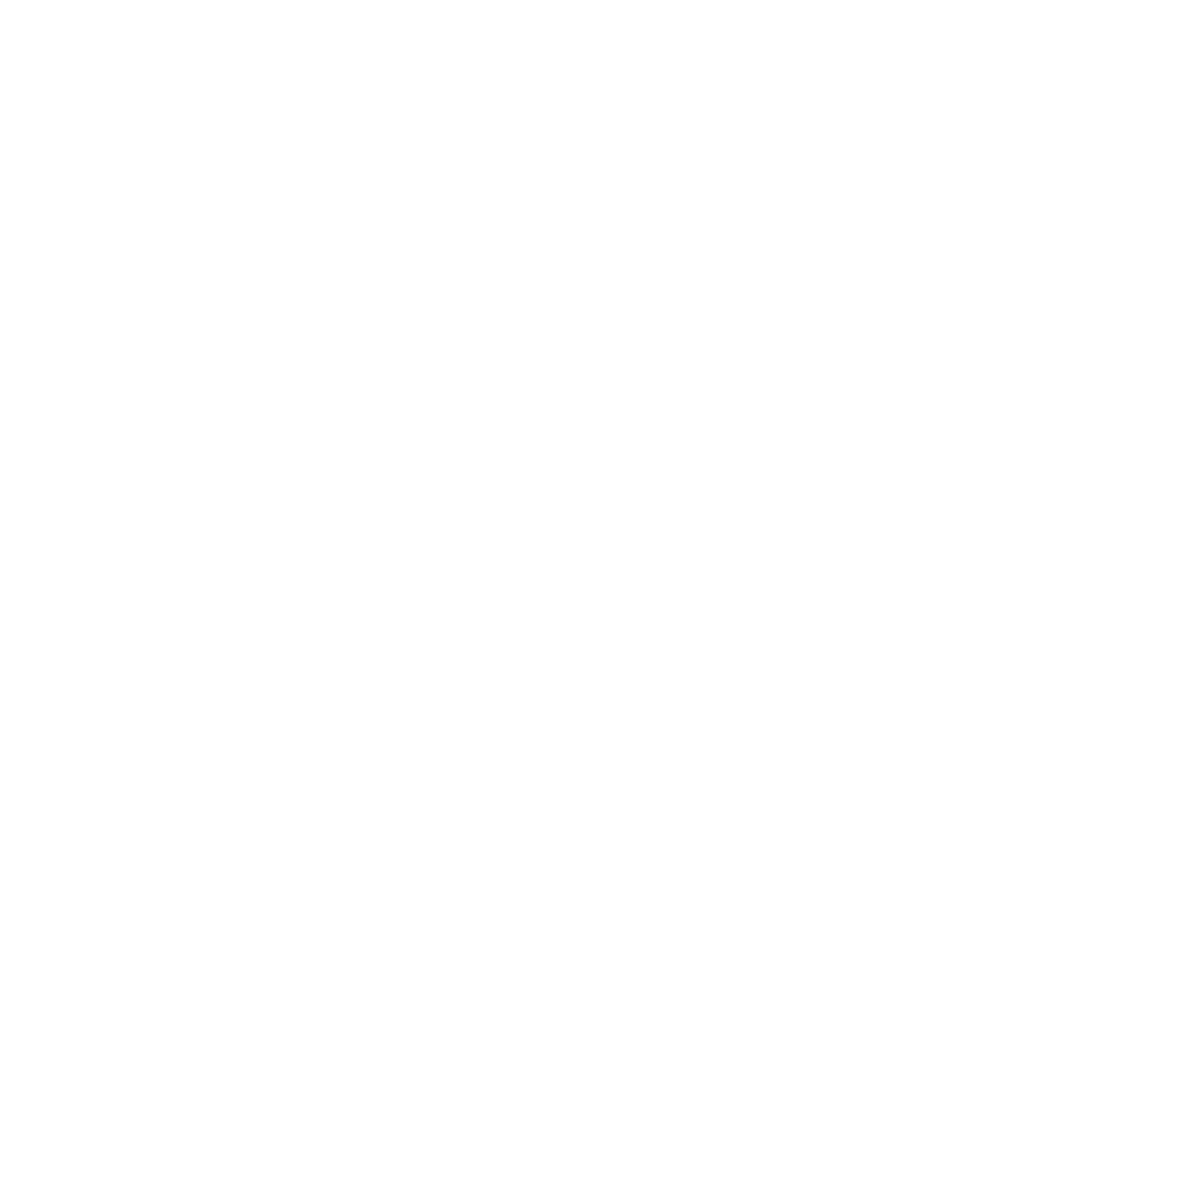 royal_Mesa de trabajo 1.png